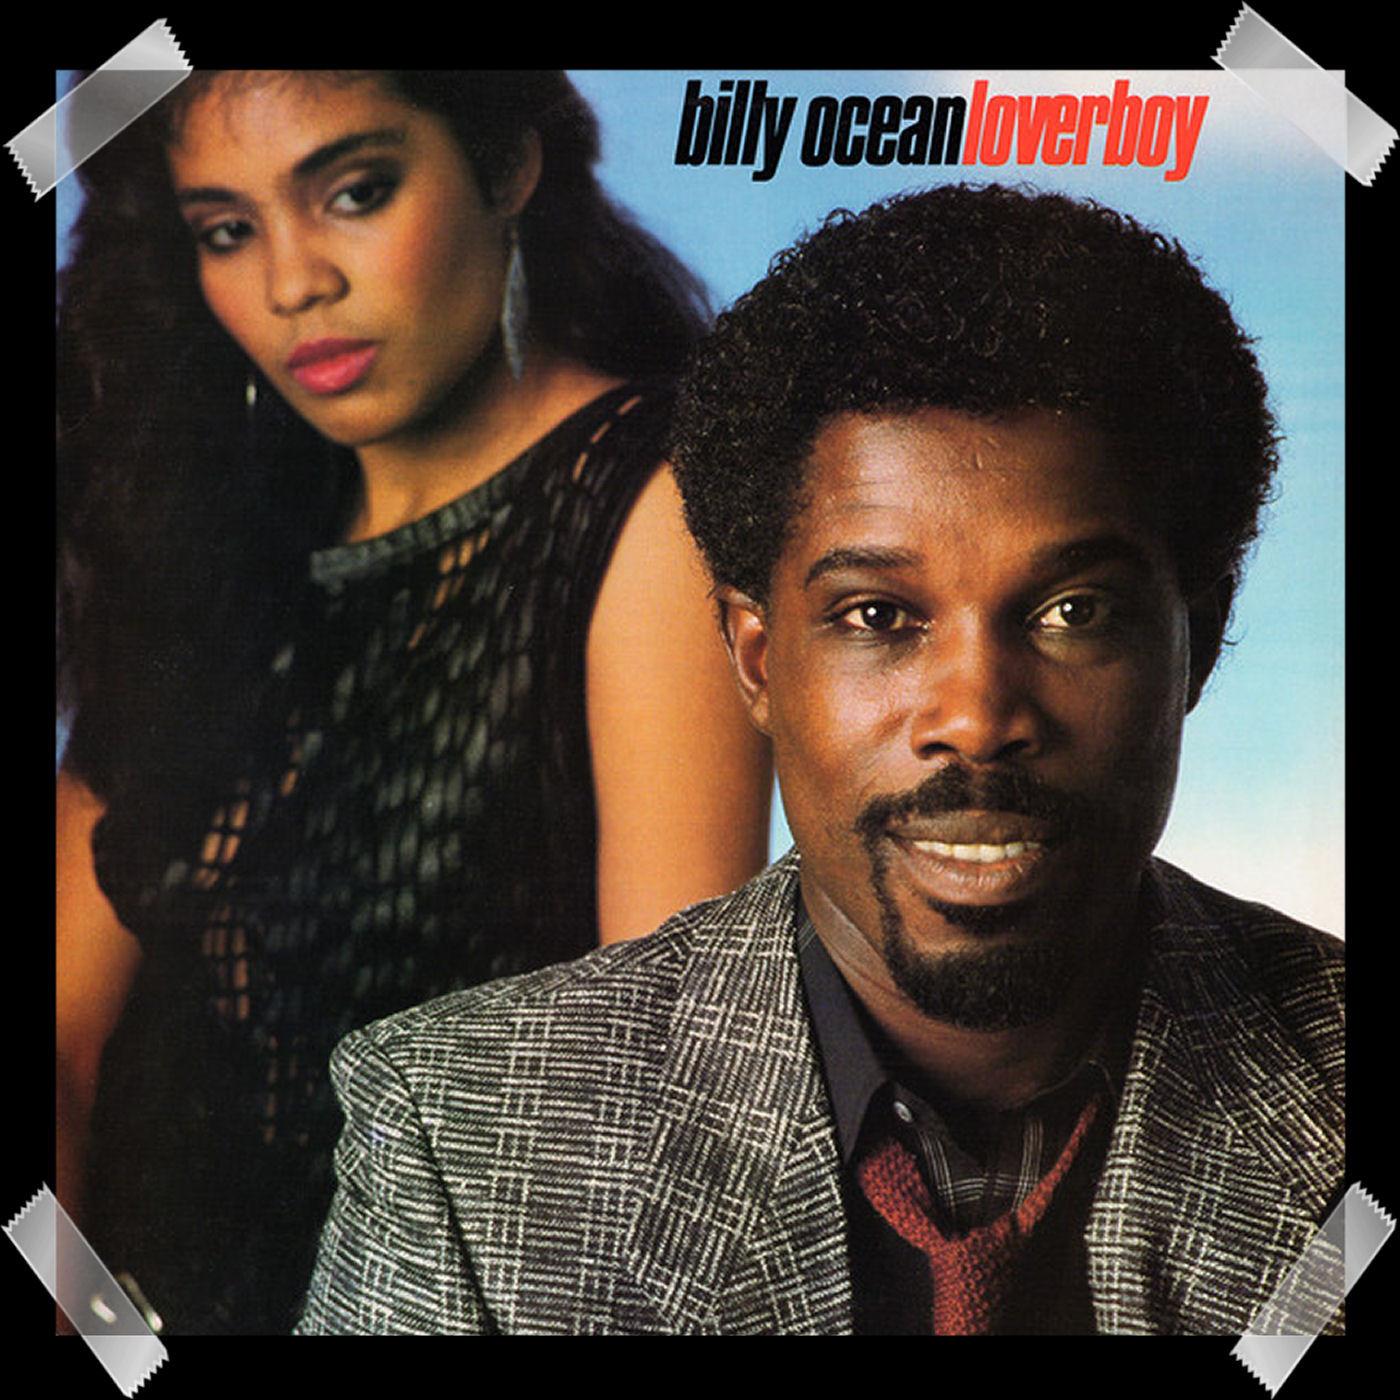 30. Billy Ocean - Loverboy